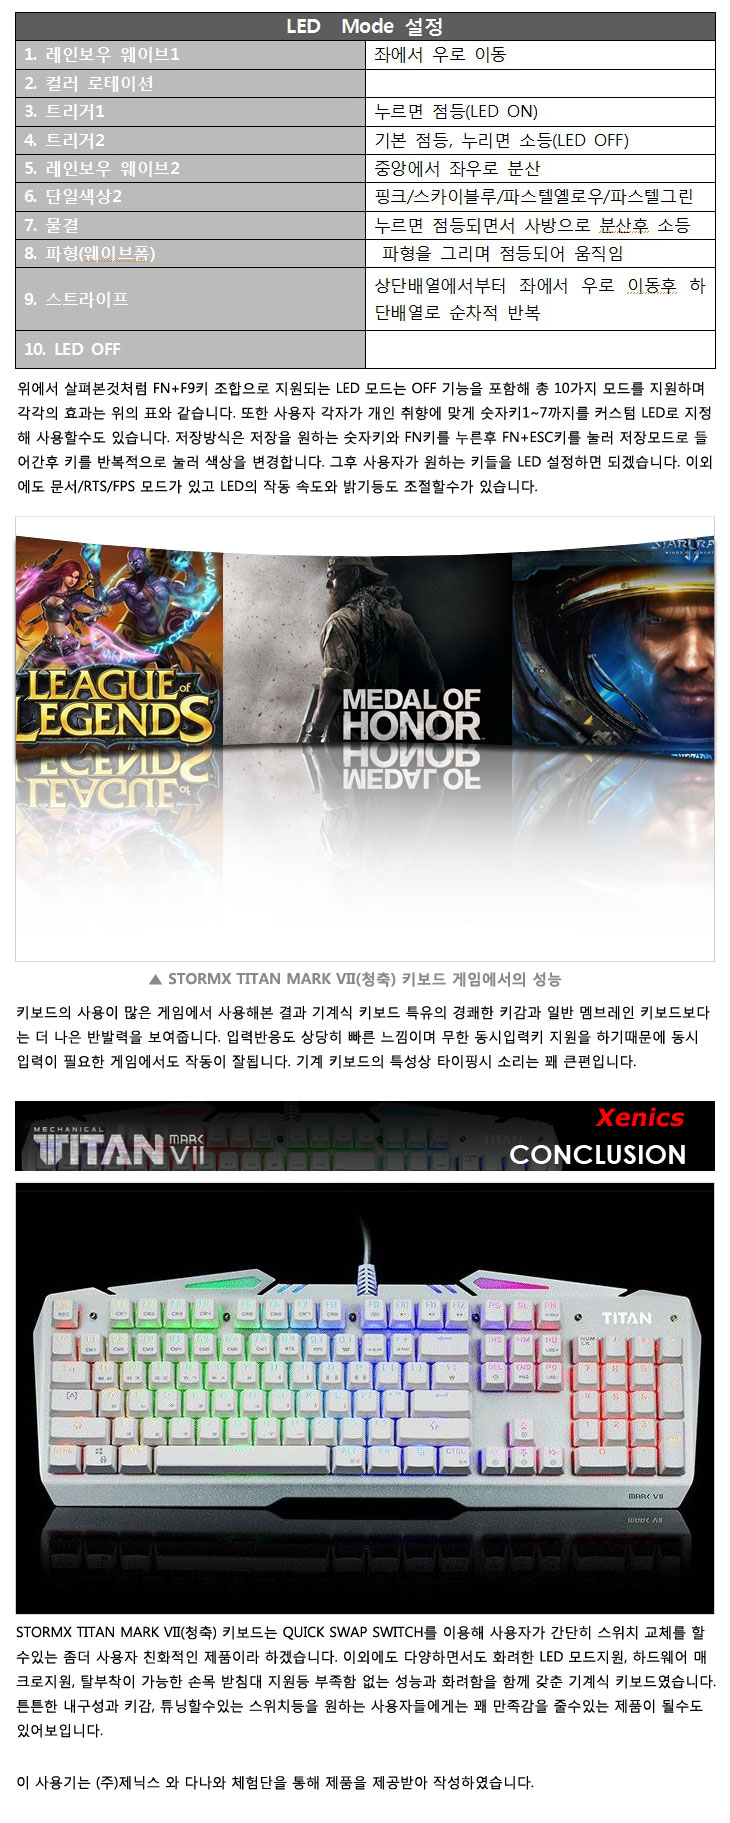 TITAN_09.jpg